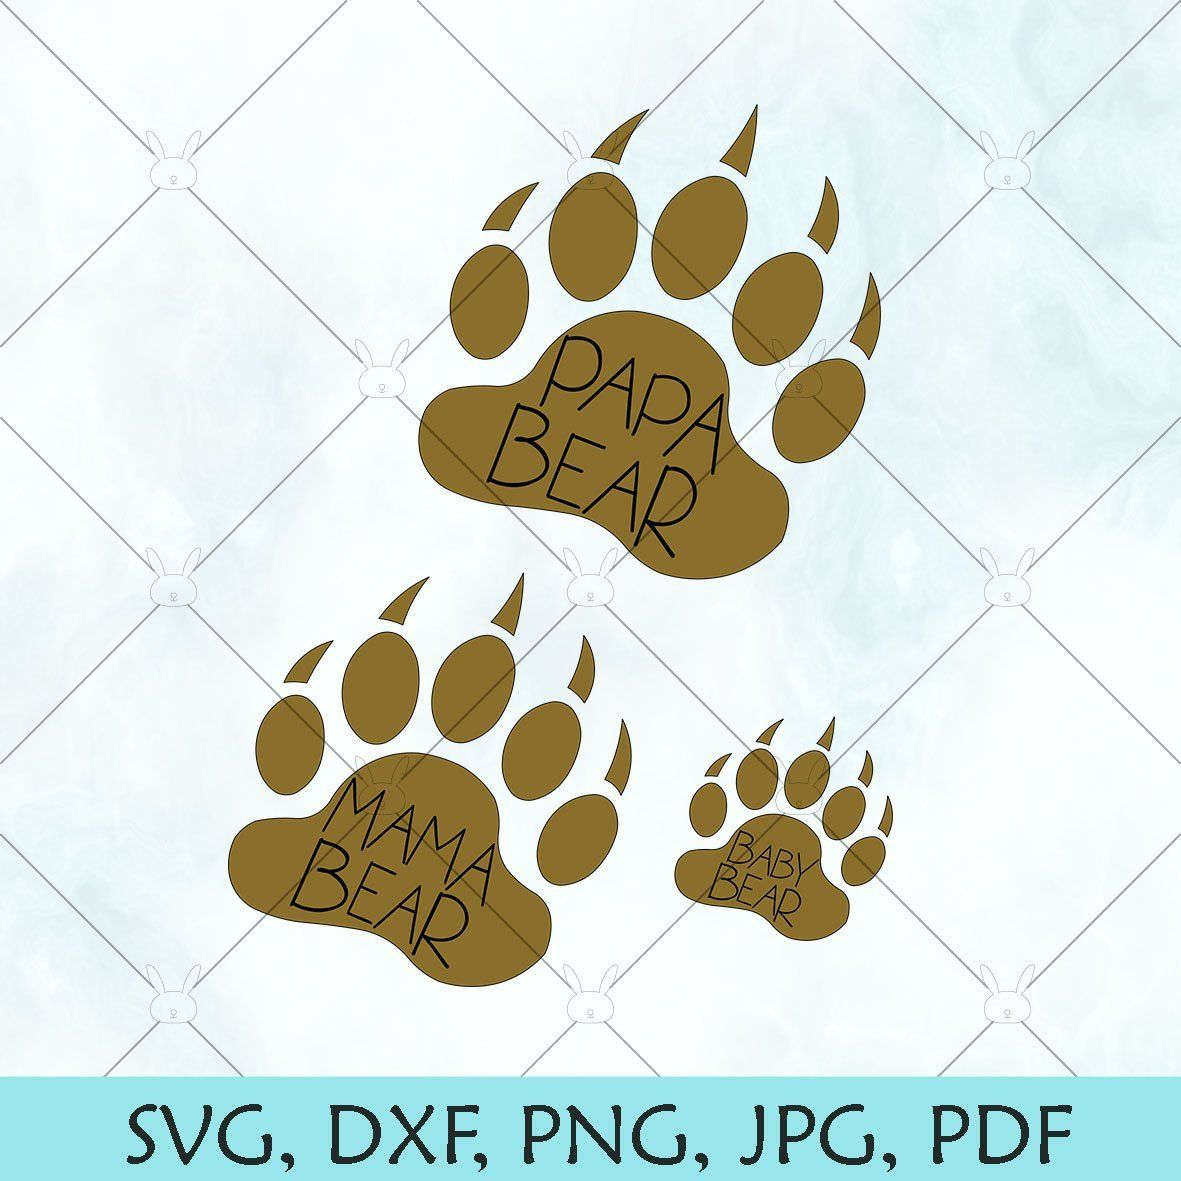 Pin on Cricut SVG Files